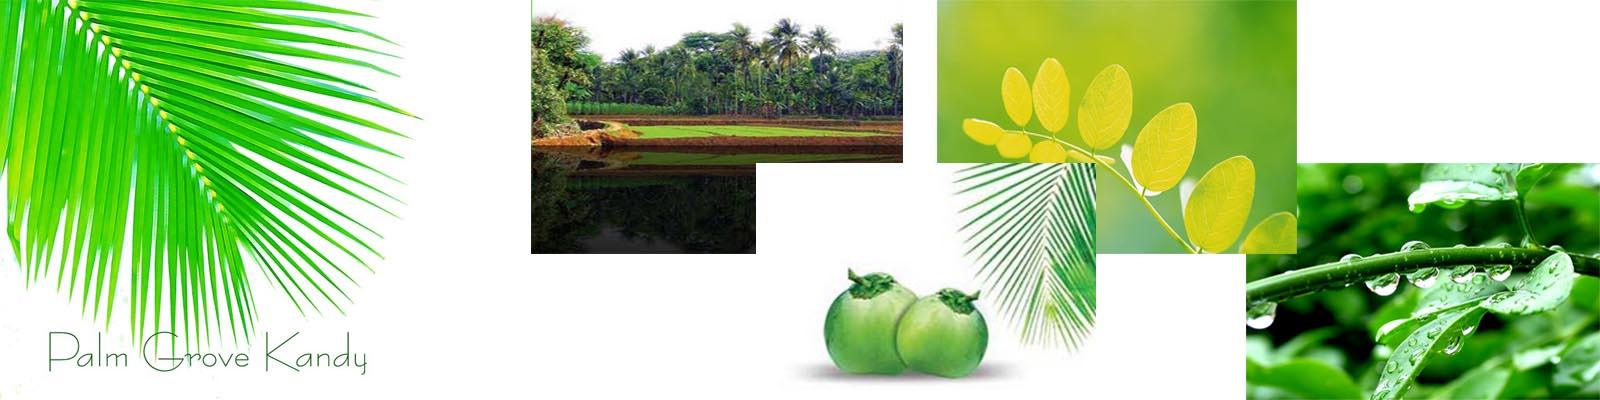 Palm Grove Kandy